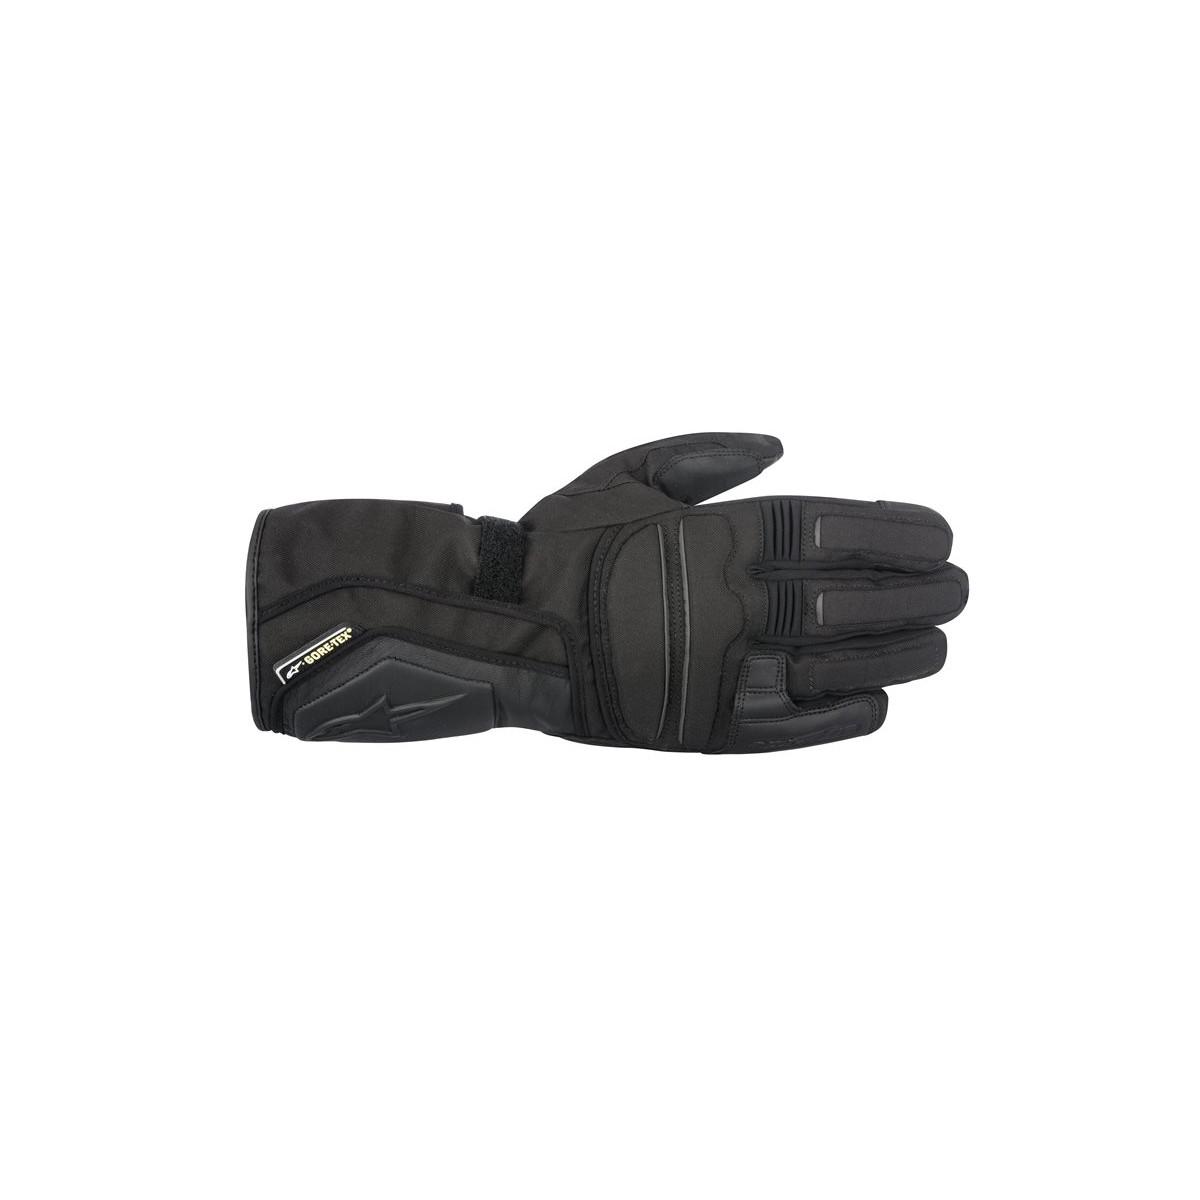 87211f76 Guantes Alpinestars WR-V GTX negro, compra online